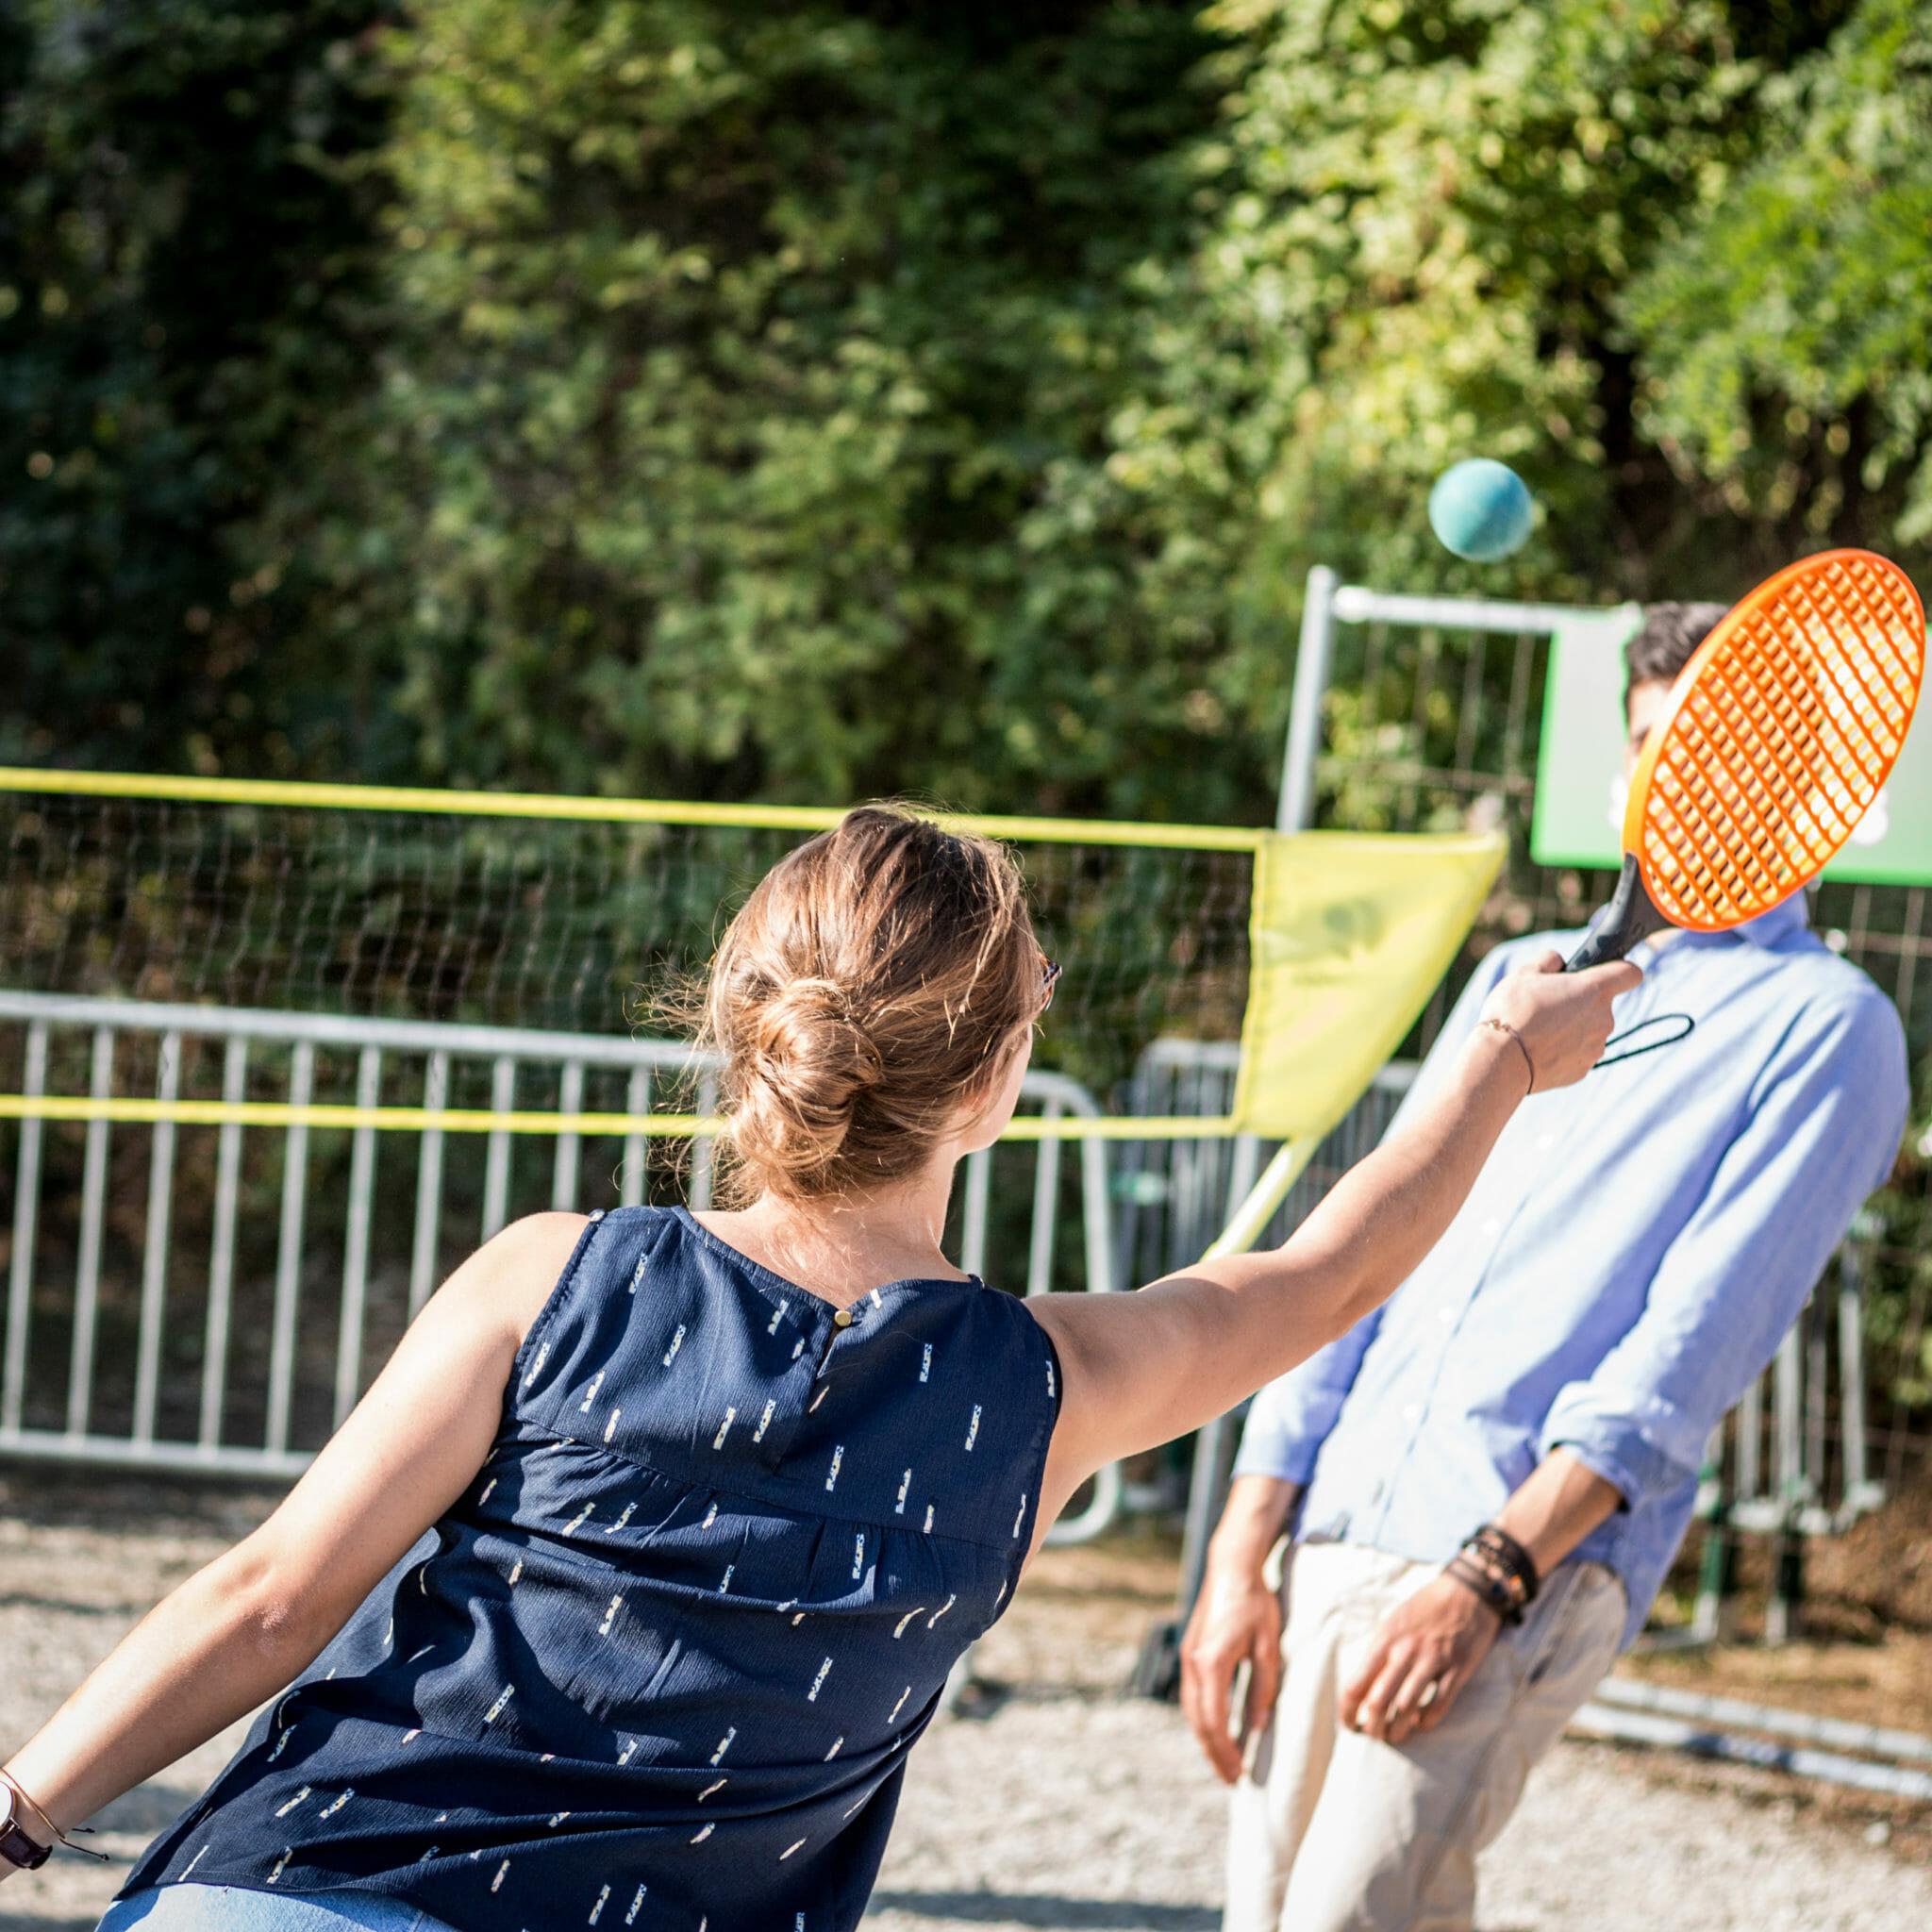 Street Bouche Festival #1 Jeu de raquette